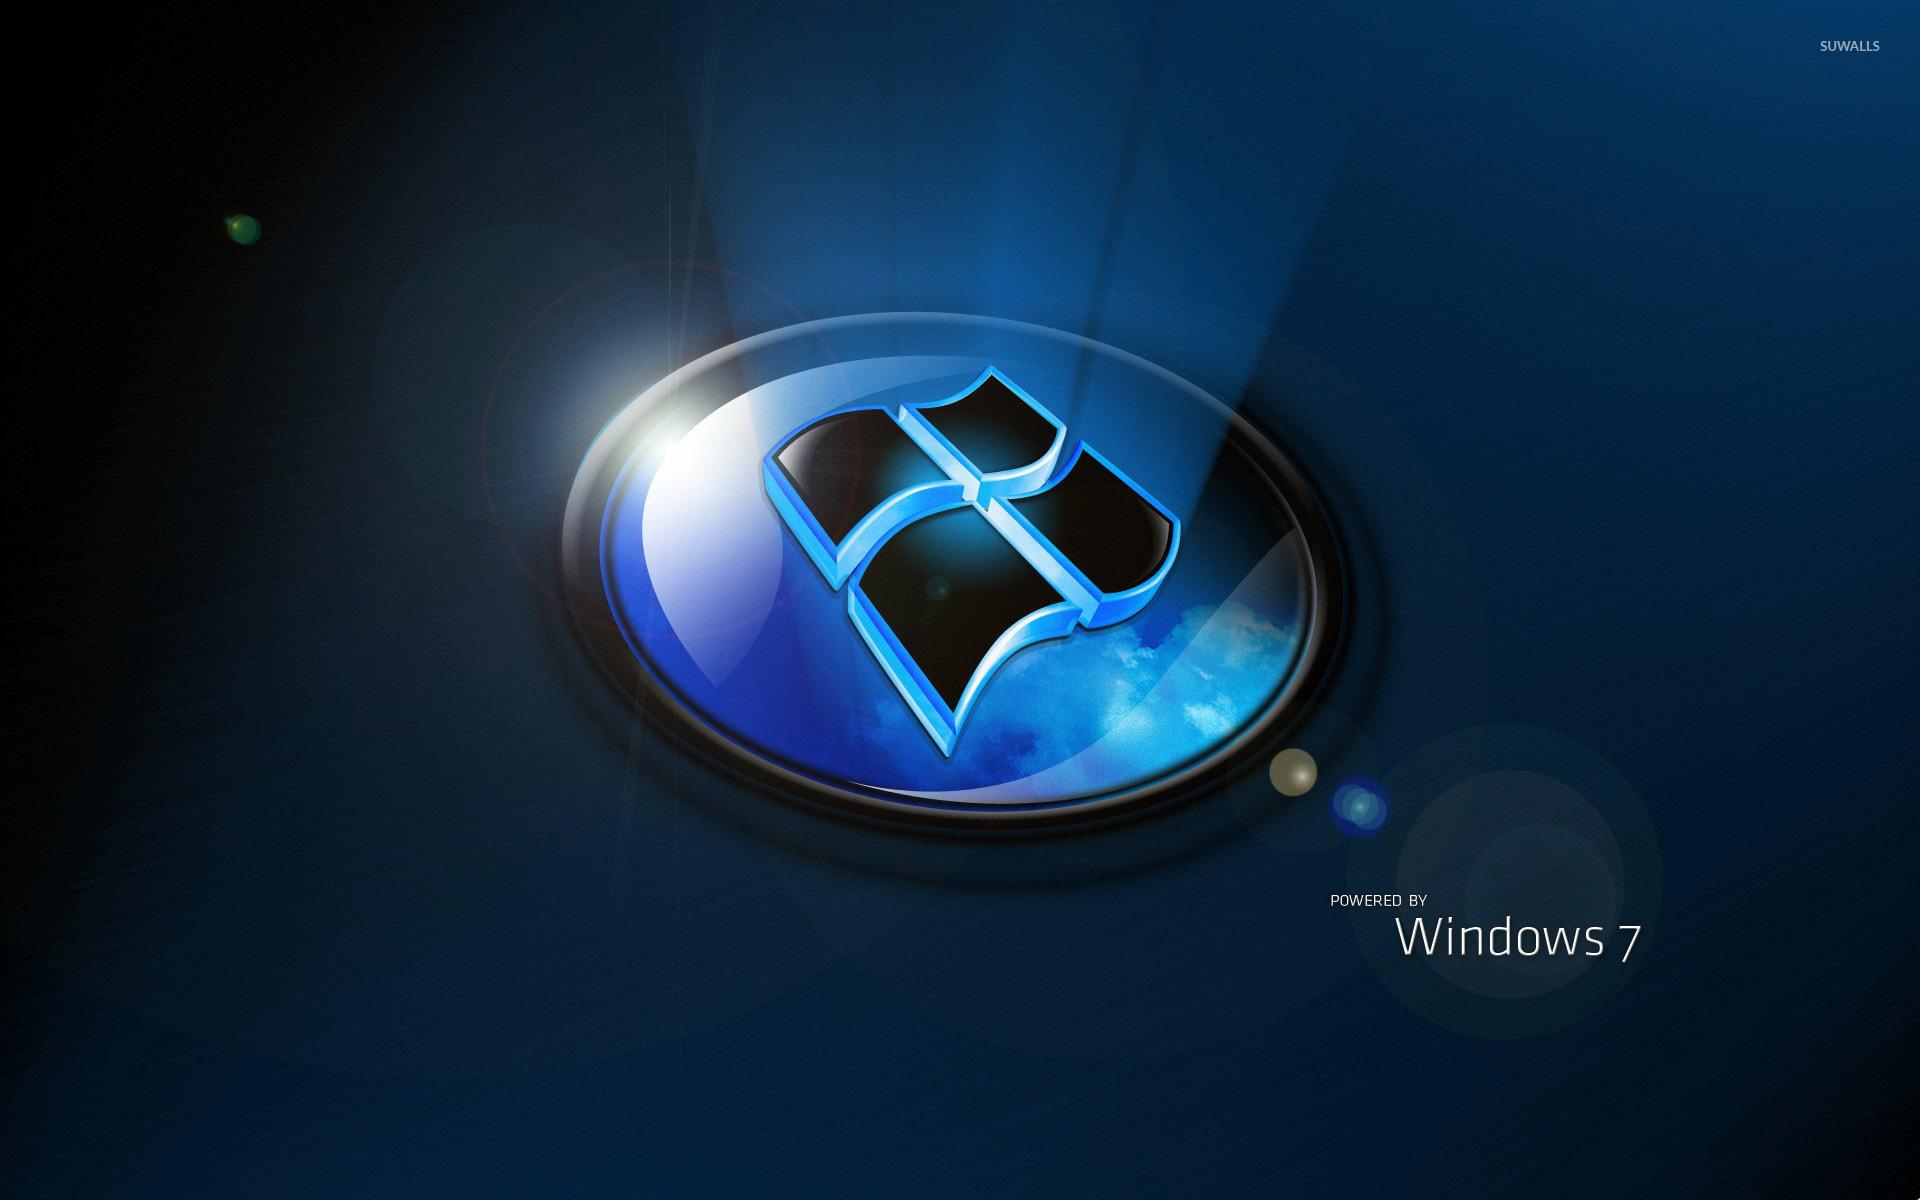 Windows 7 [4] wallpaper 1920x1200 jpg